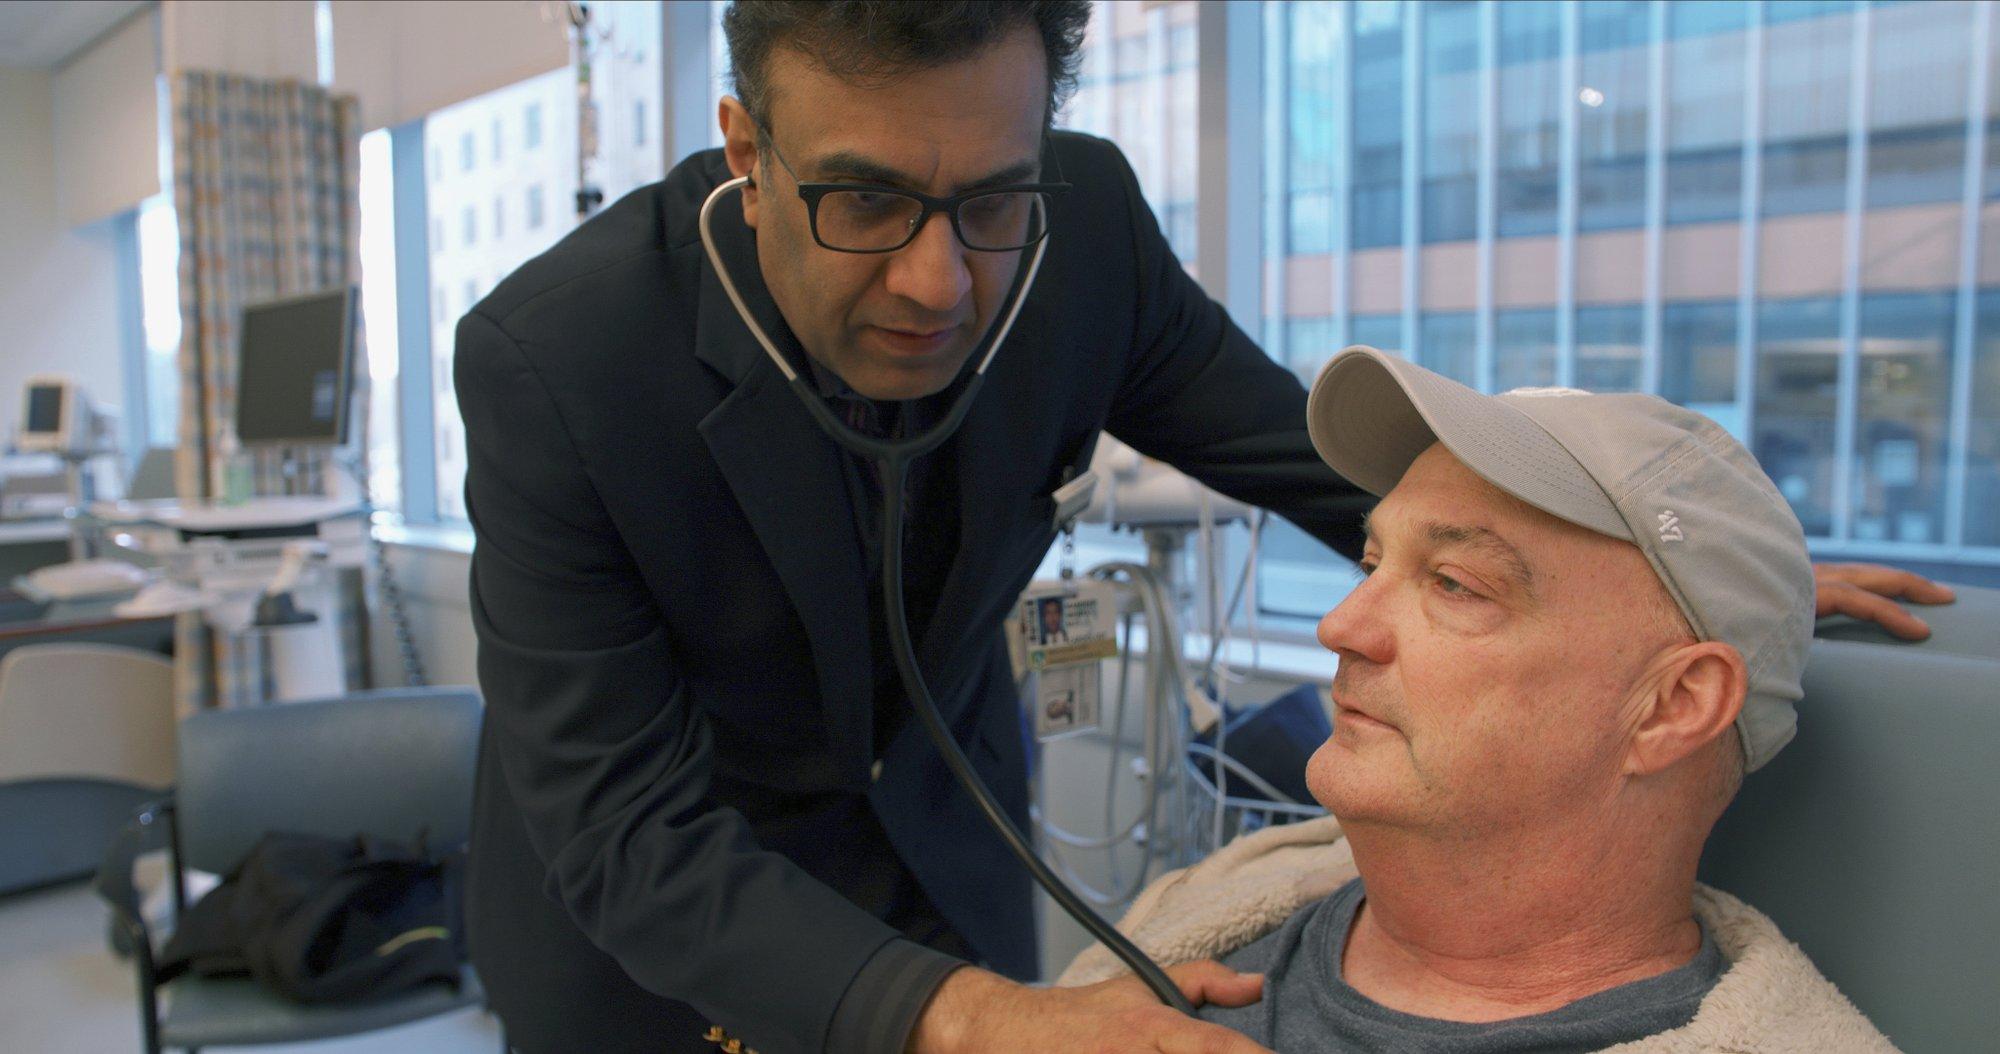 Doctor Checks Patient